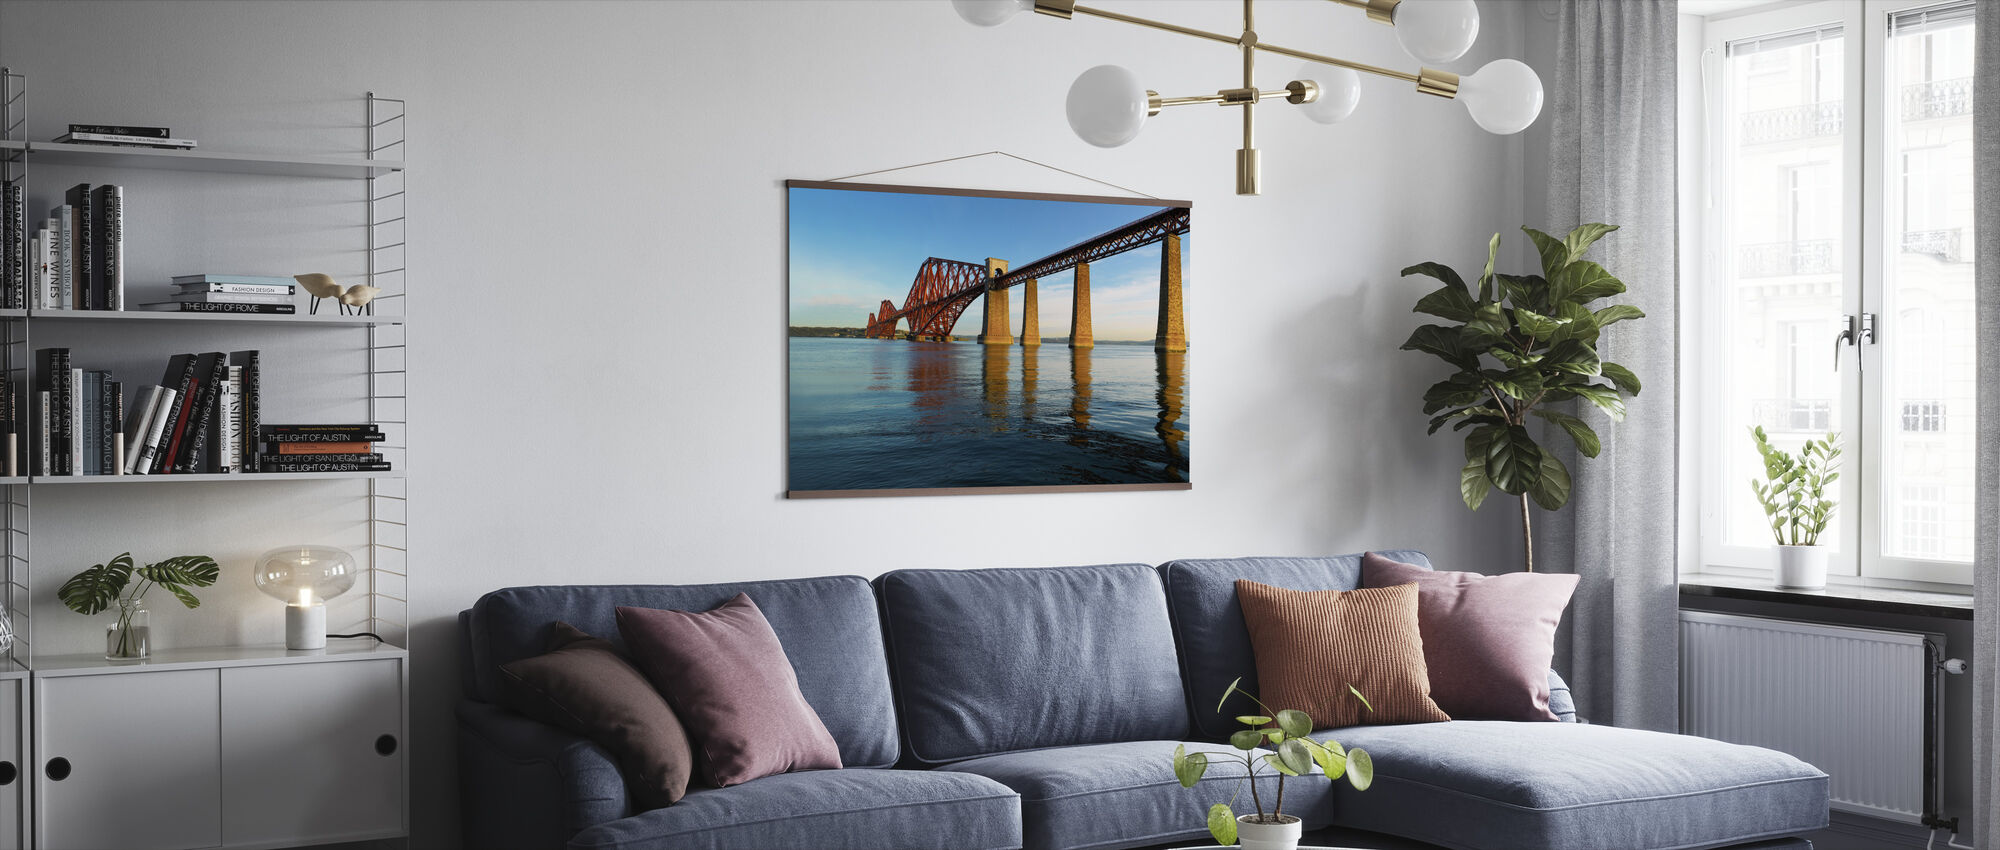 Dawn at Forth Road Bridge, Scotland - Poster - Living Room